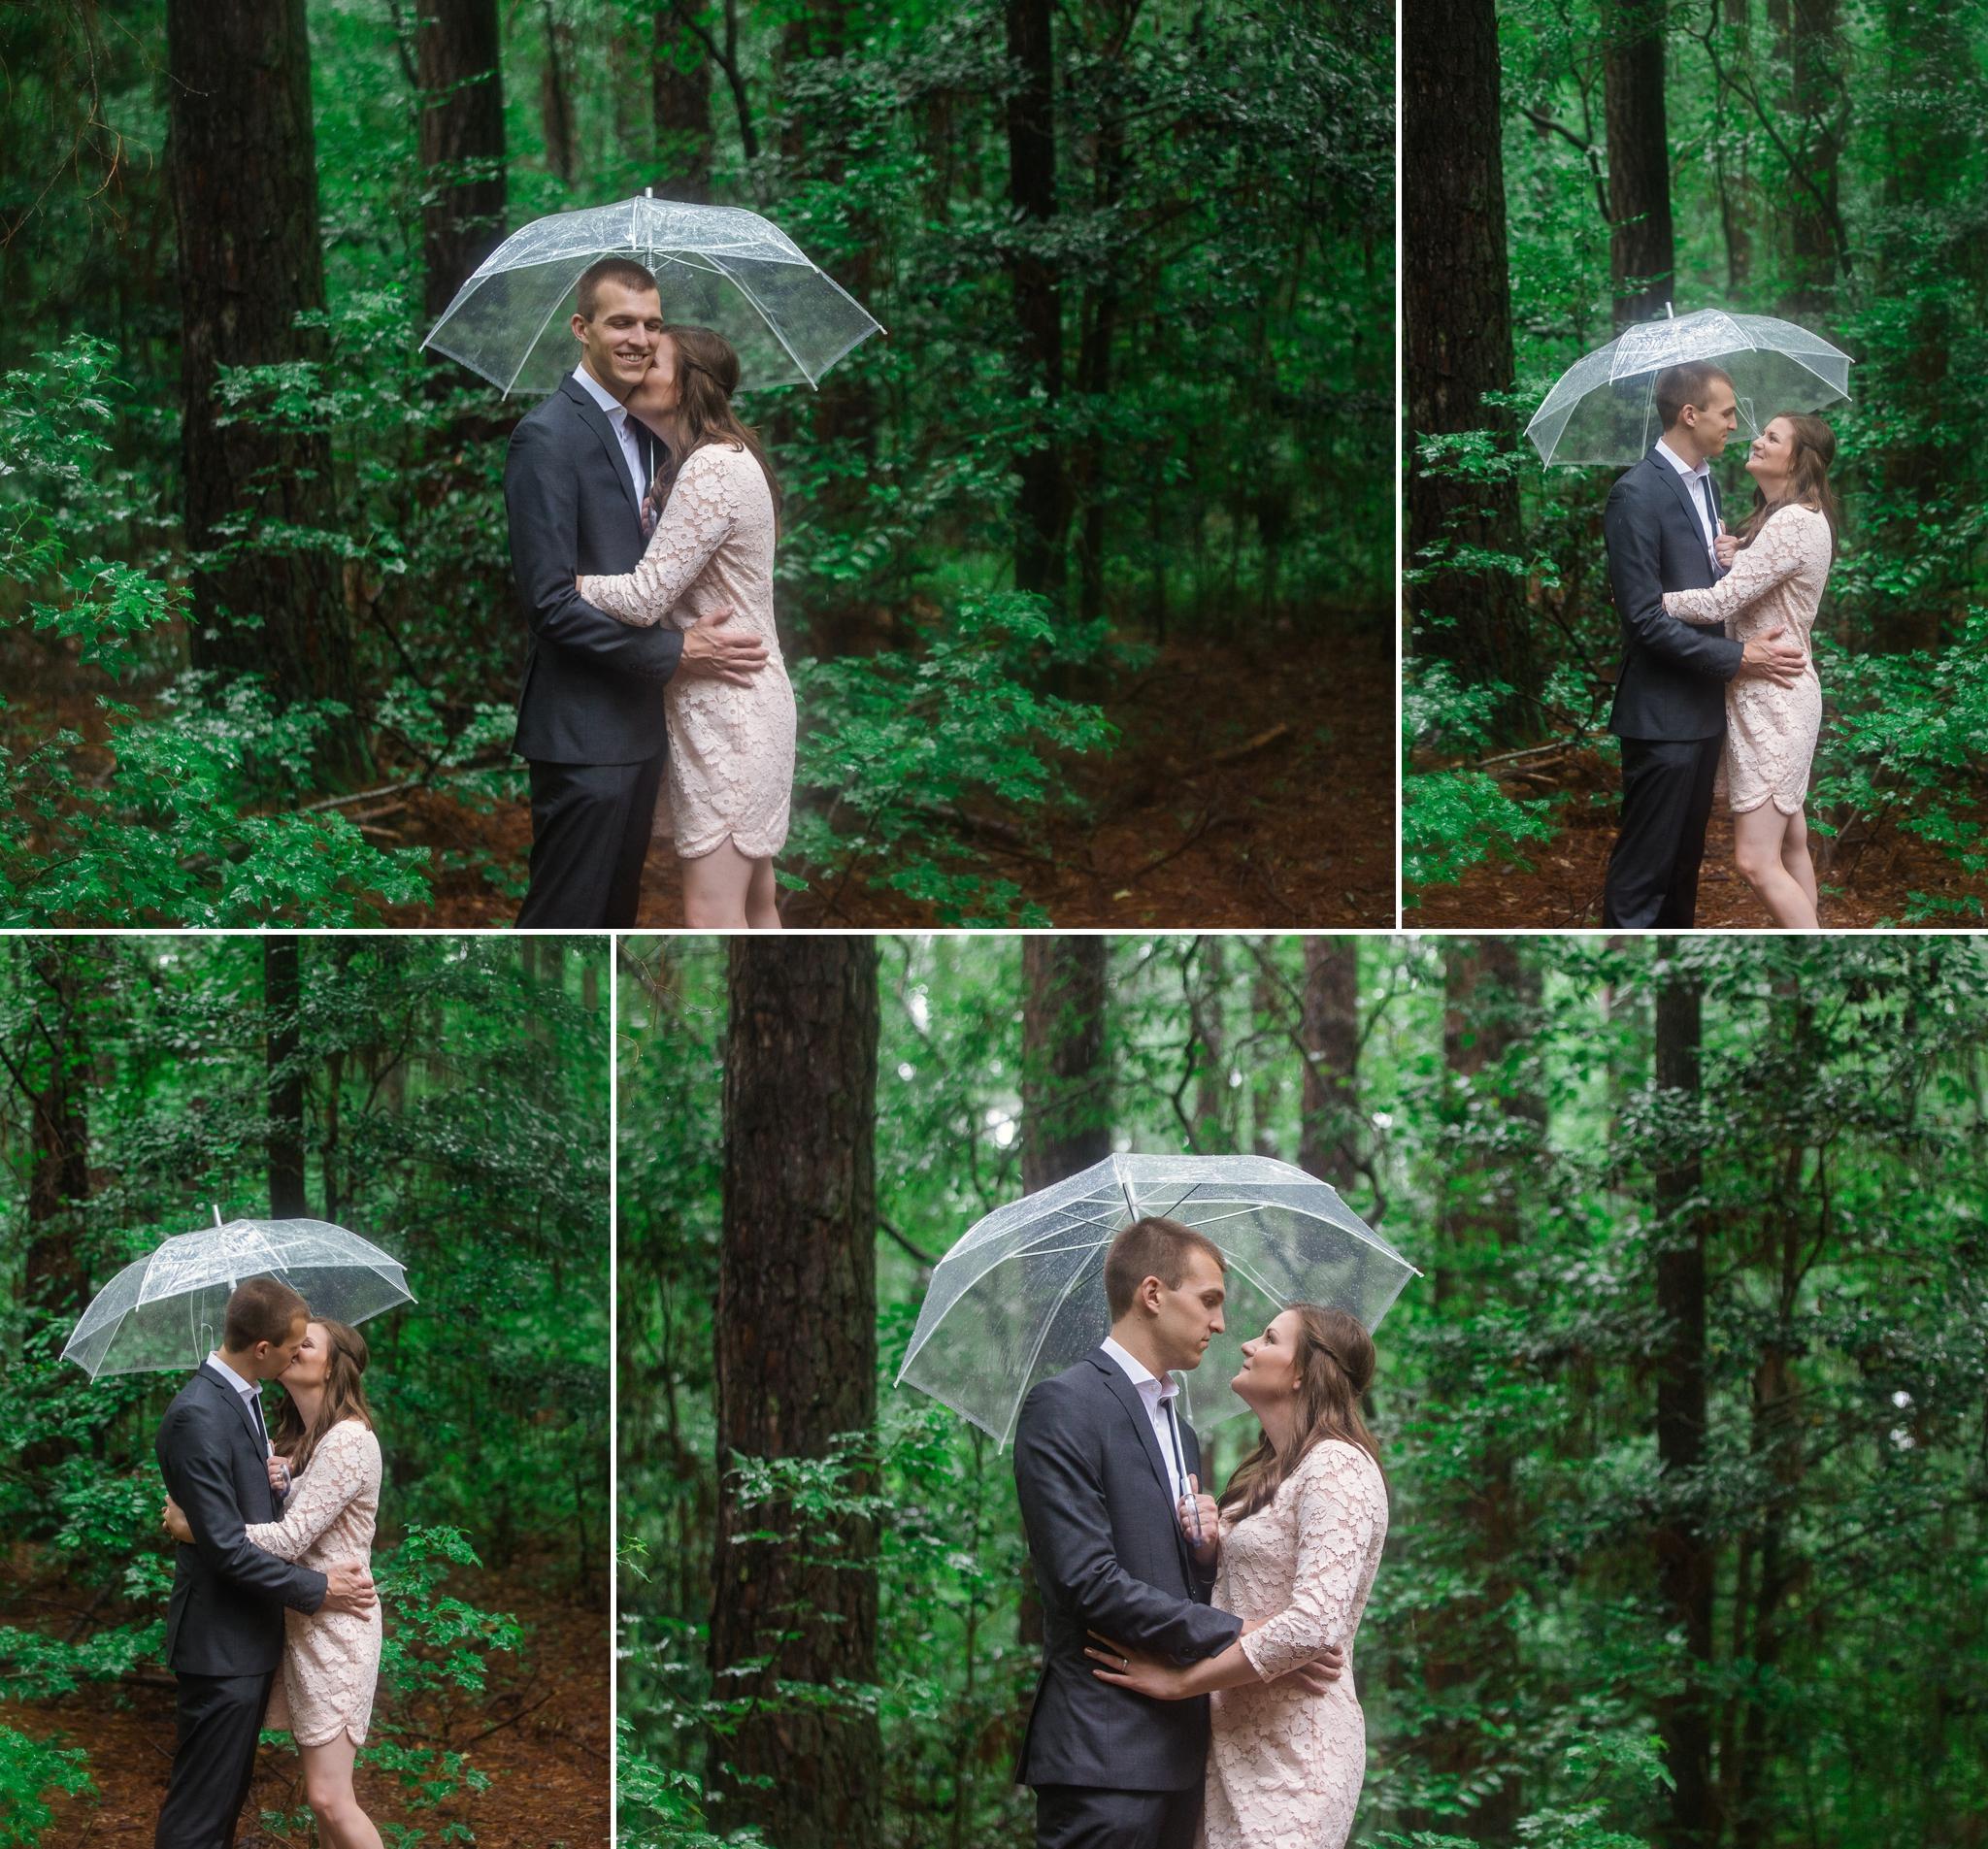 Elopement Photography in Congaree National Park, South Carolina